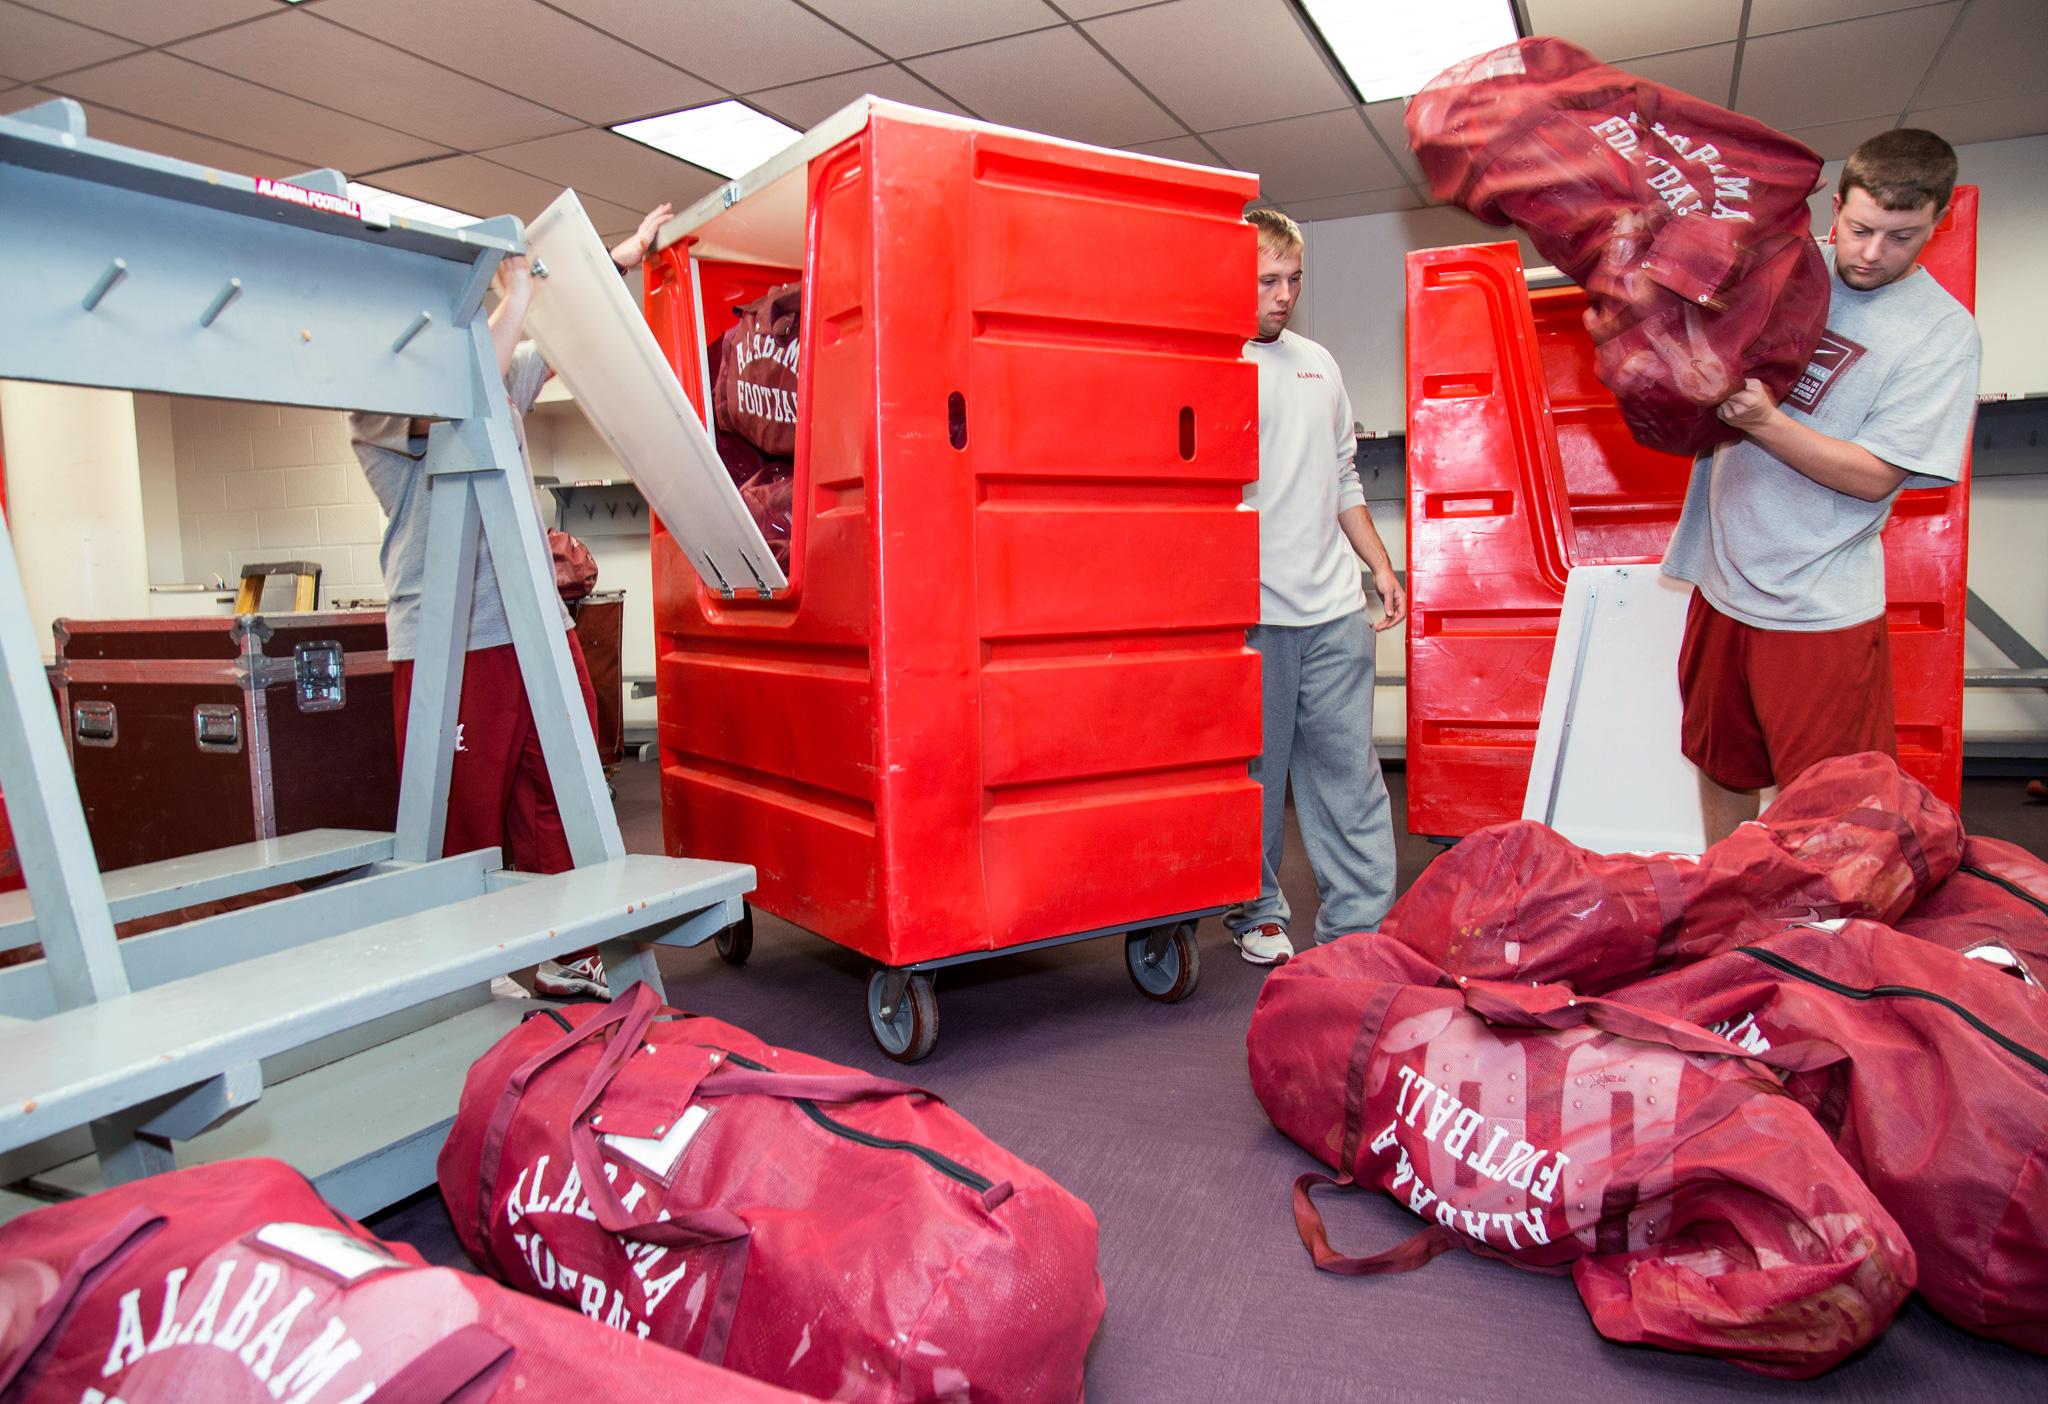 Equipment mangers unload the truck